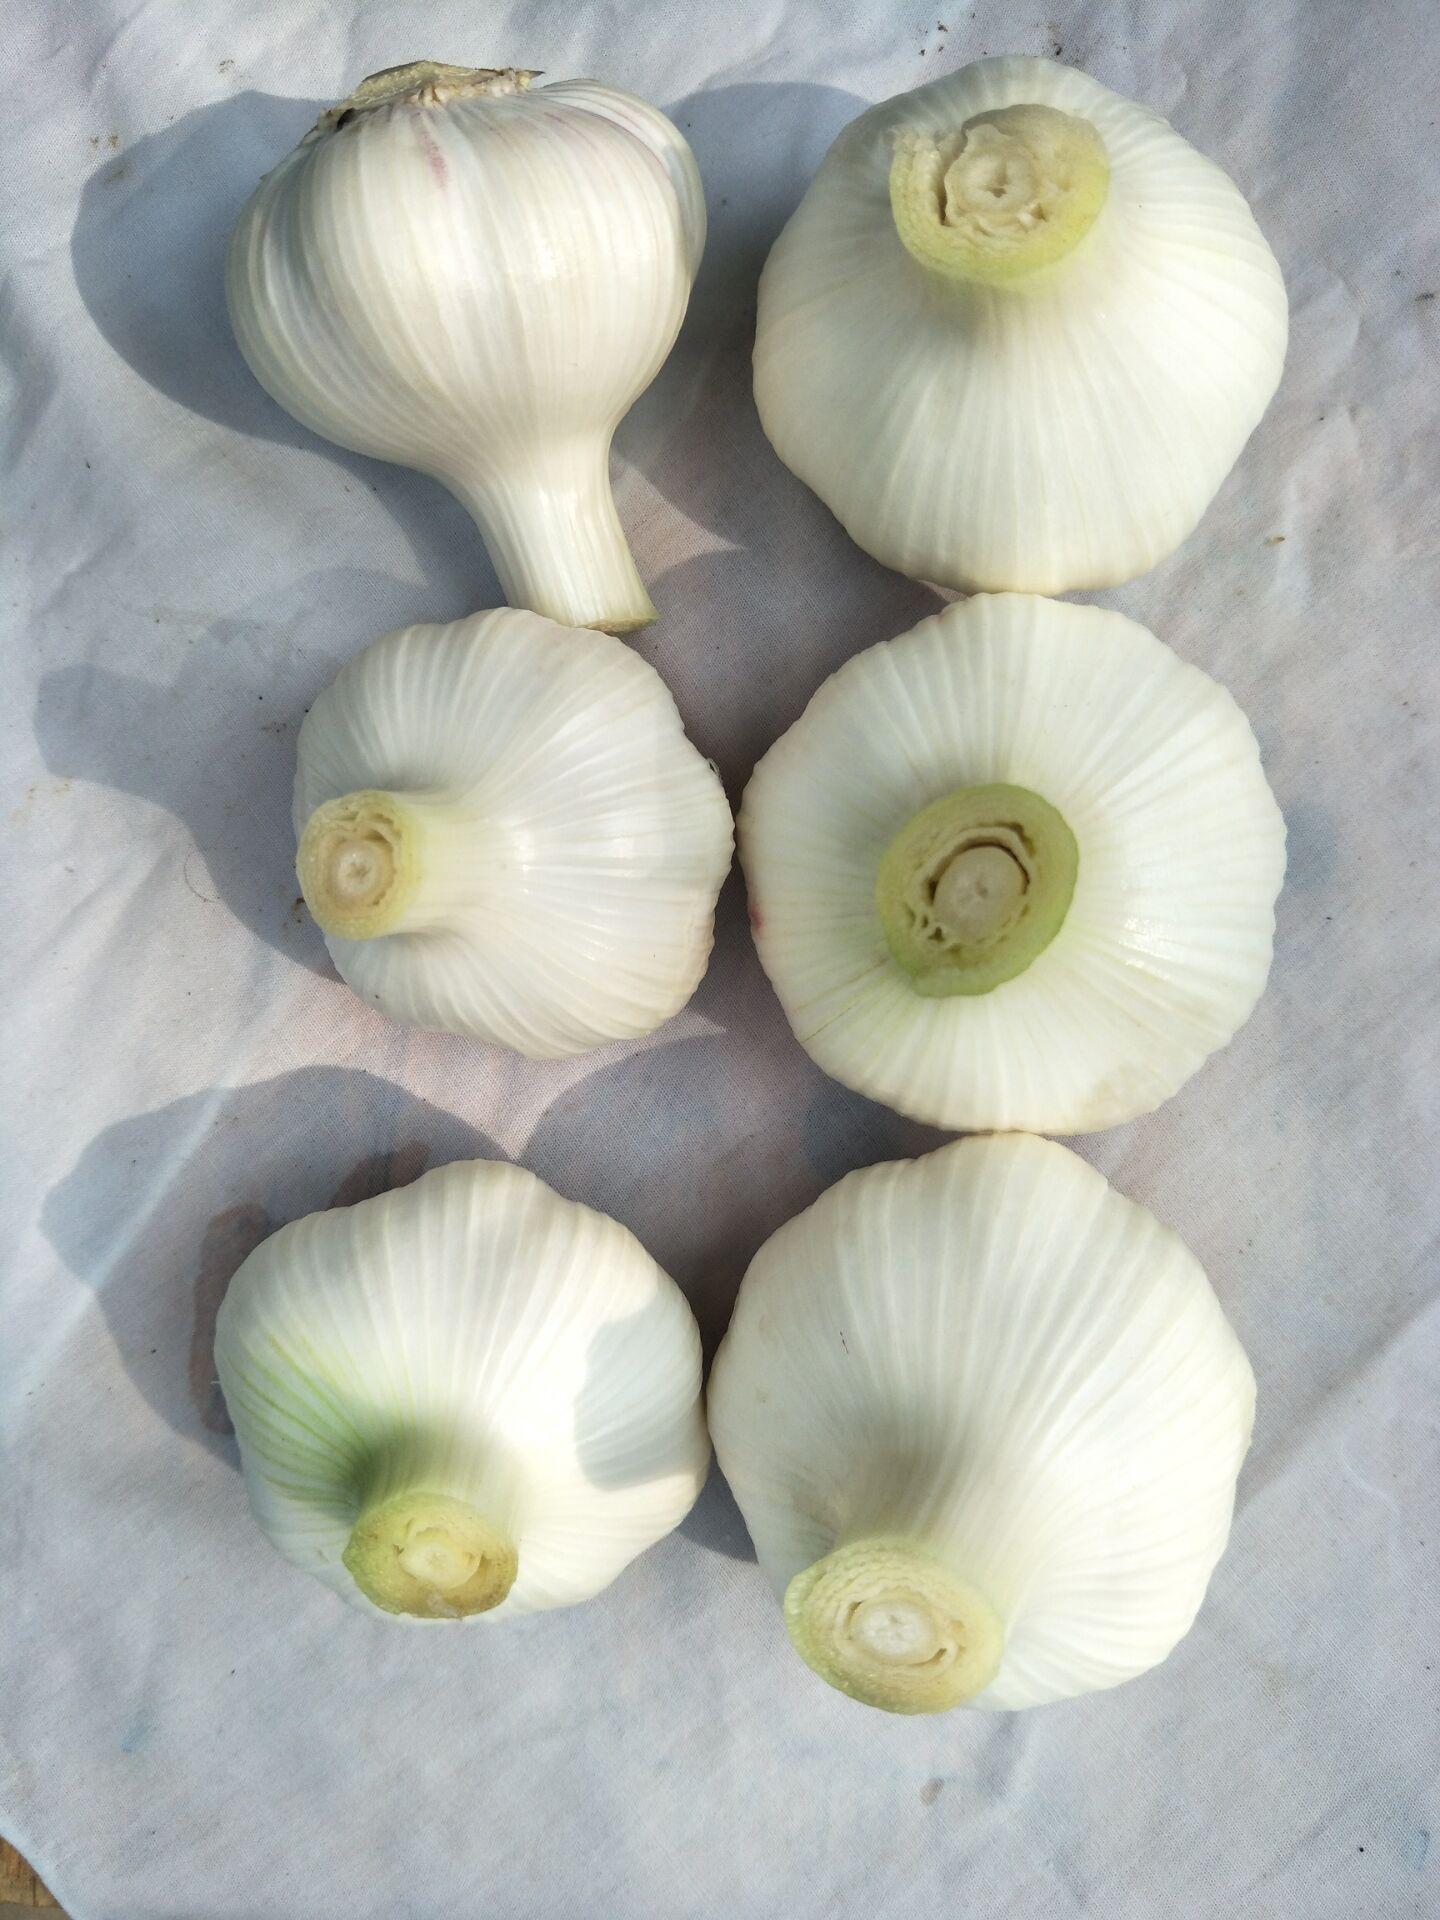 export fresh garlics, gingers